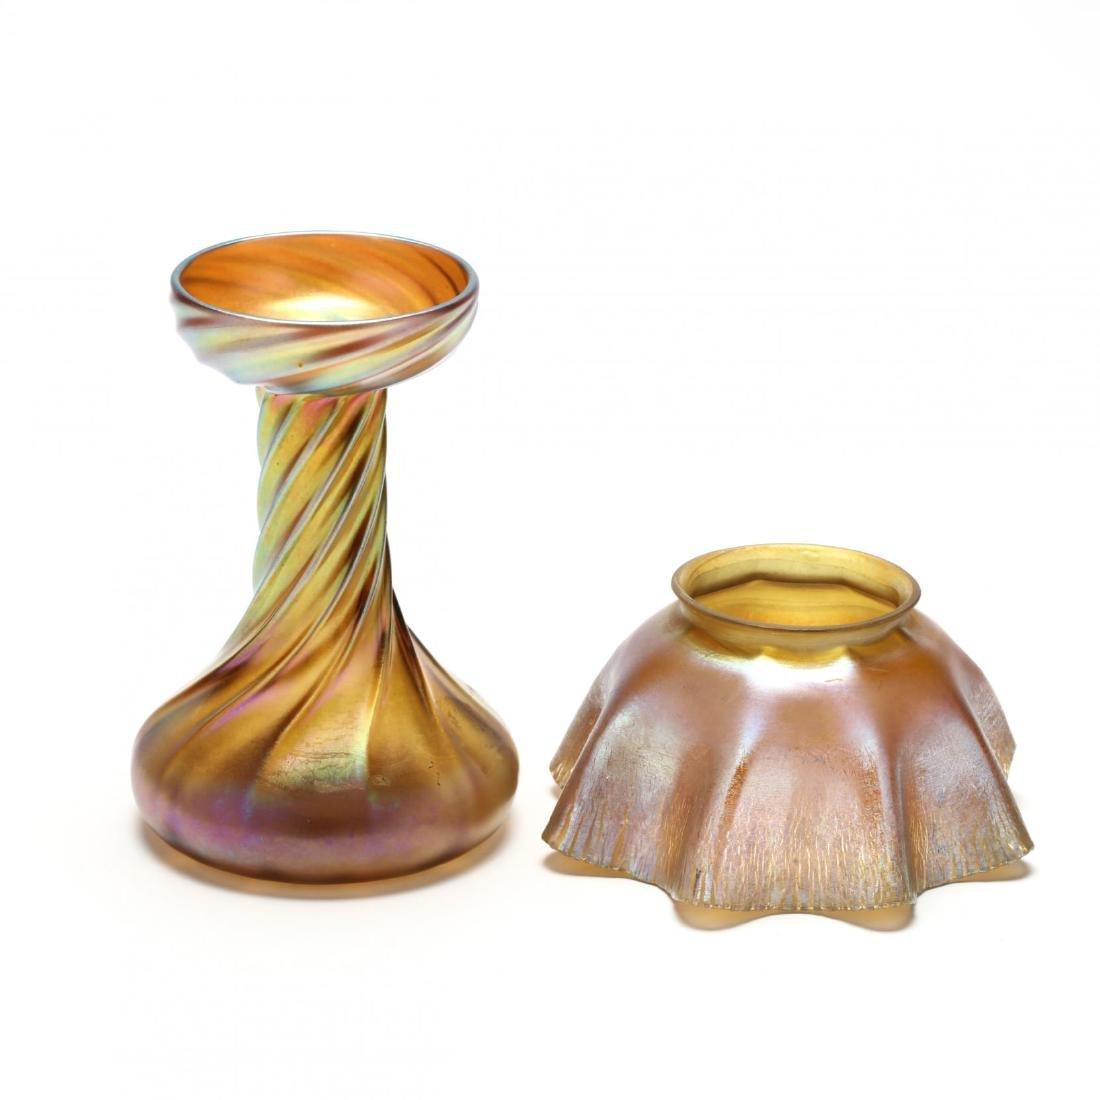 L.C. Tiffany, Seven Pieces of Favrile Art Glass - 2